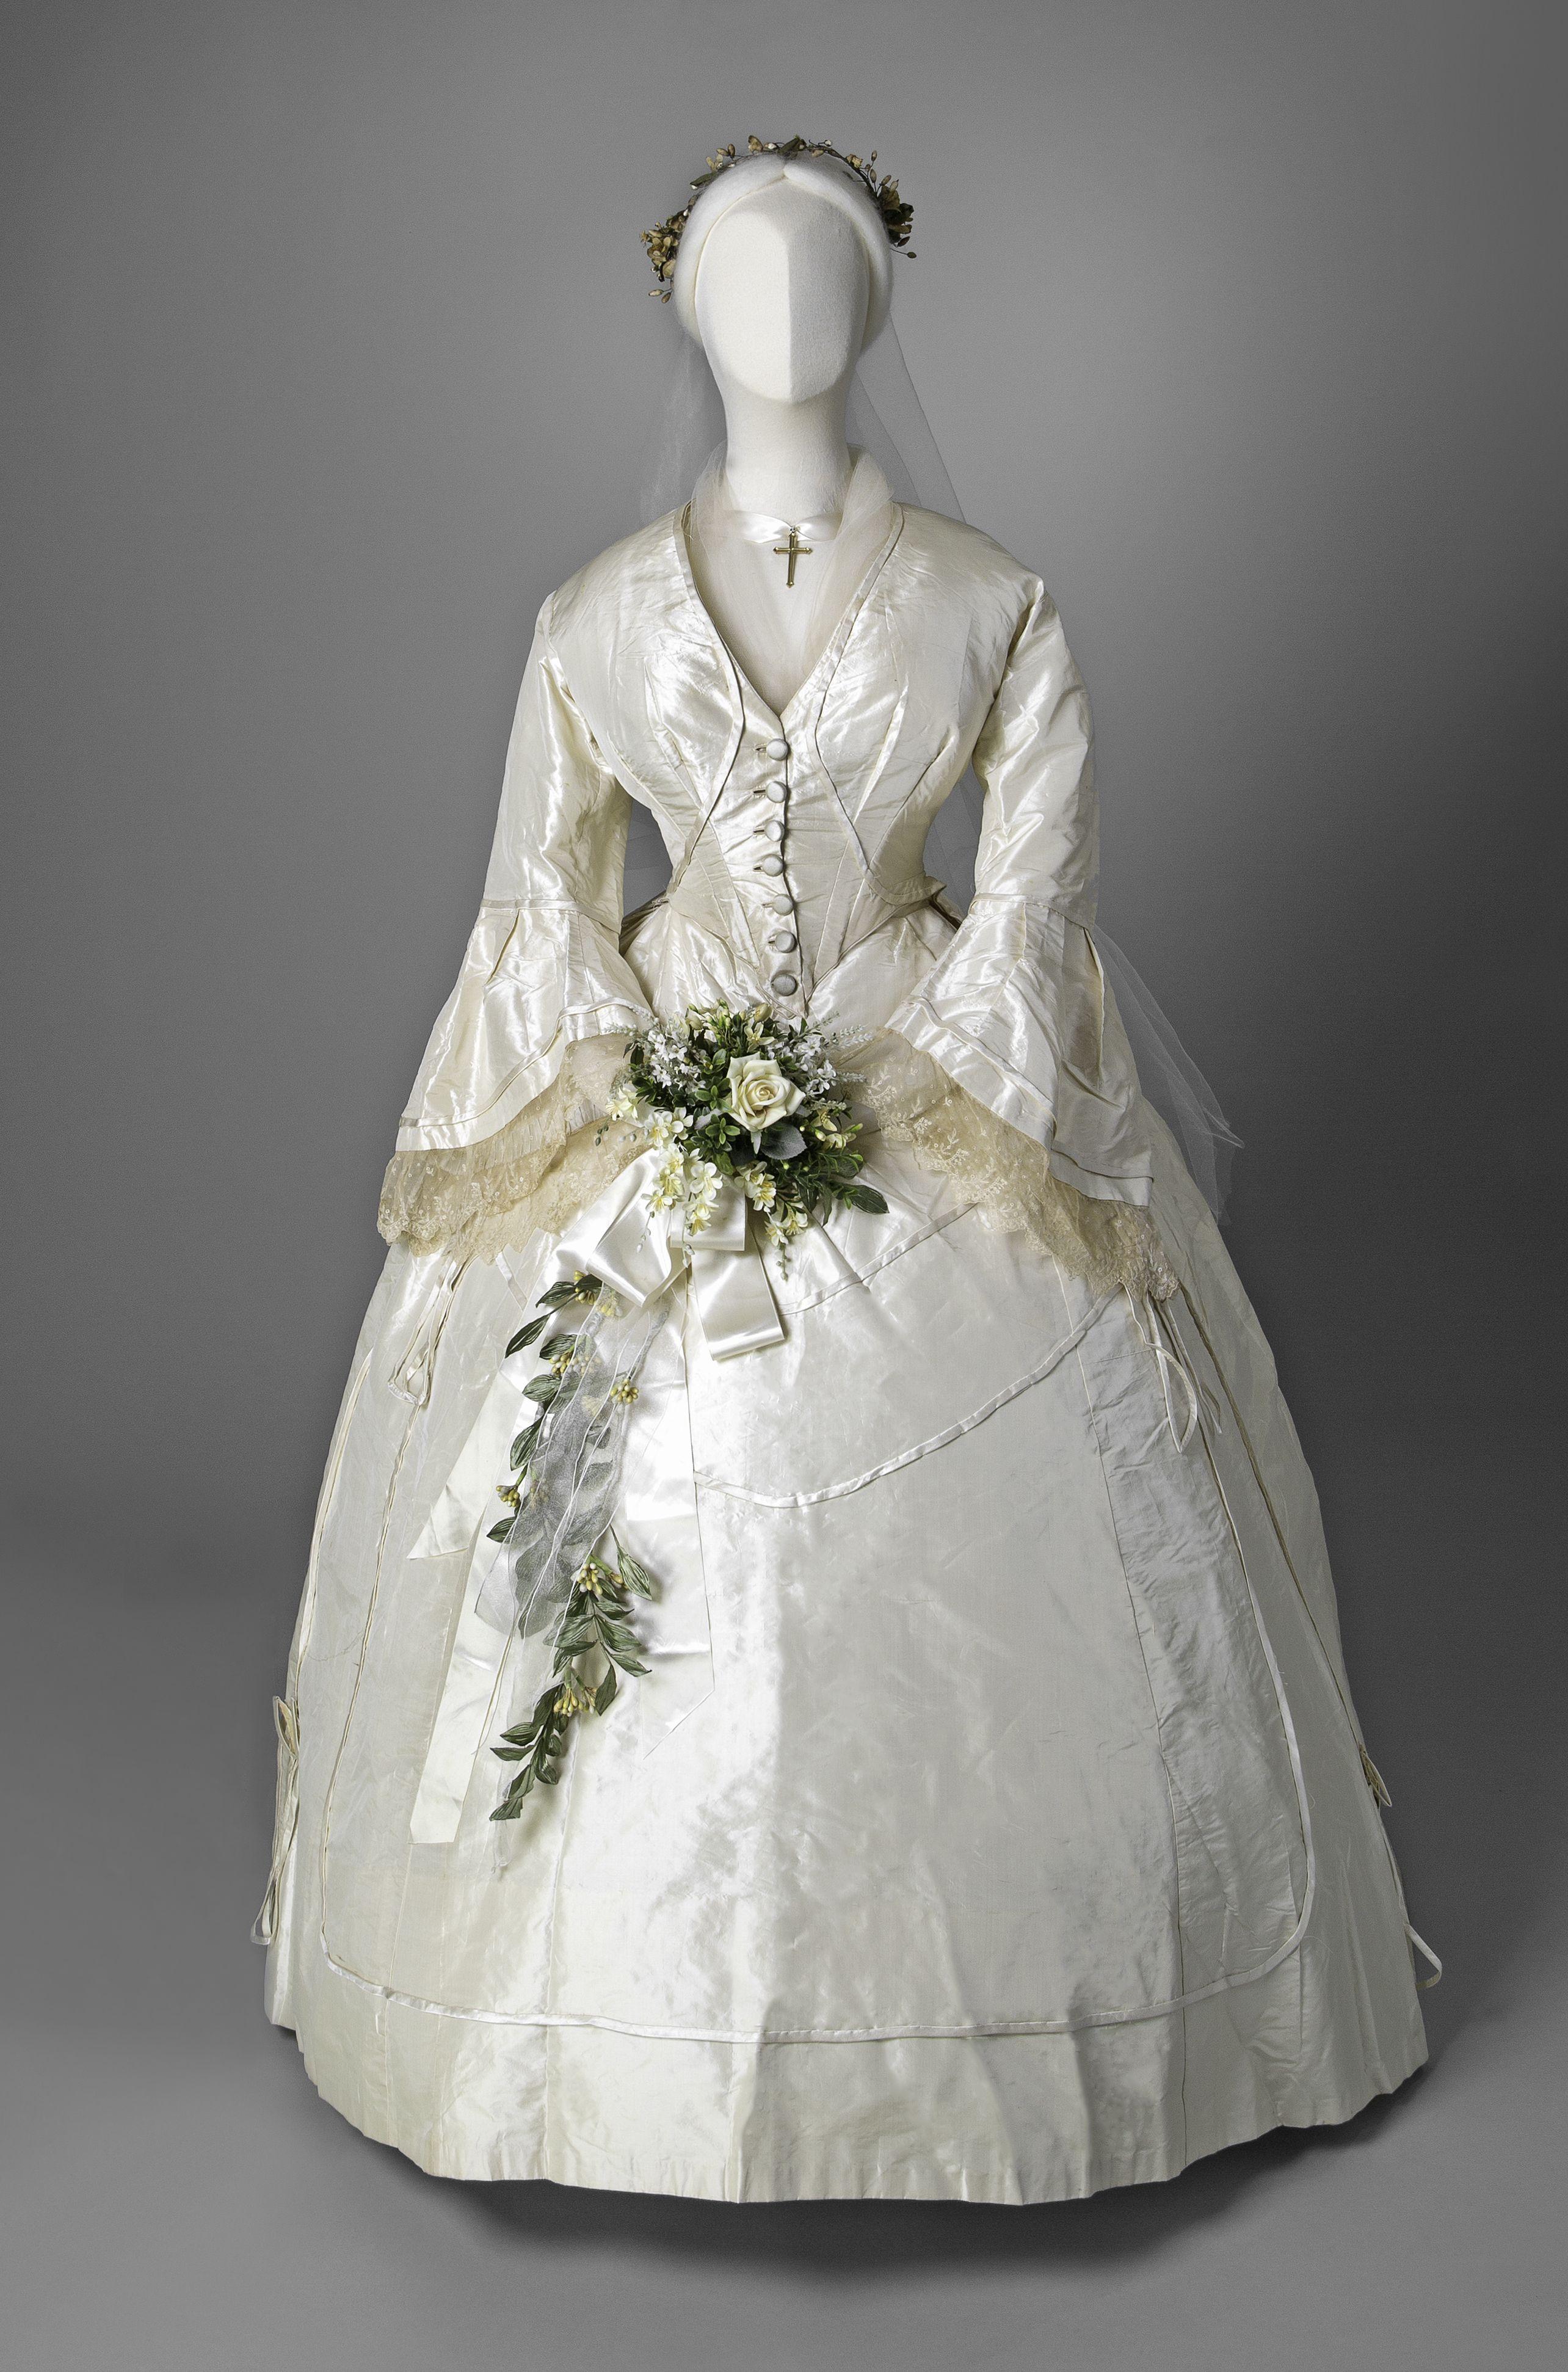 Wedding Gown 1865 Click Through For Huge Hi Def Photo Sigal Museum Antique Wedding Dresses Wedding Gowns Vintage Wedding Dresses Vintage